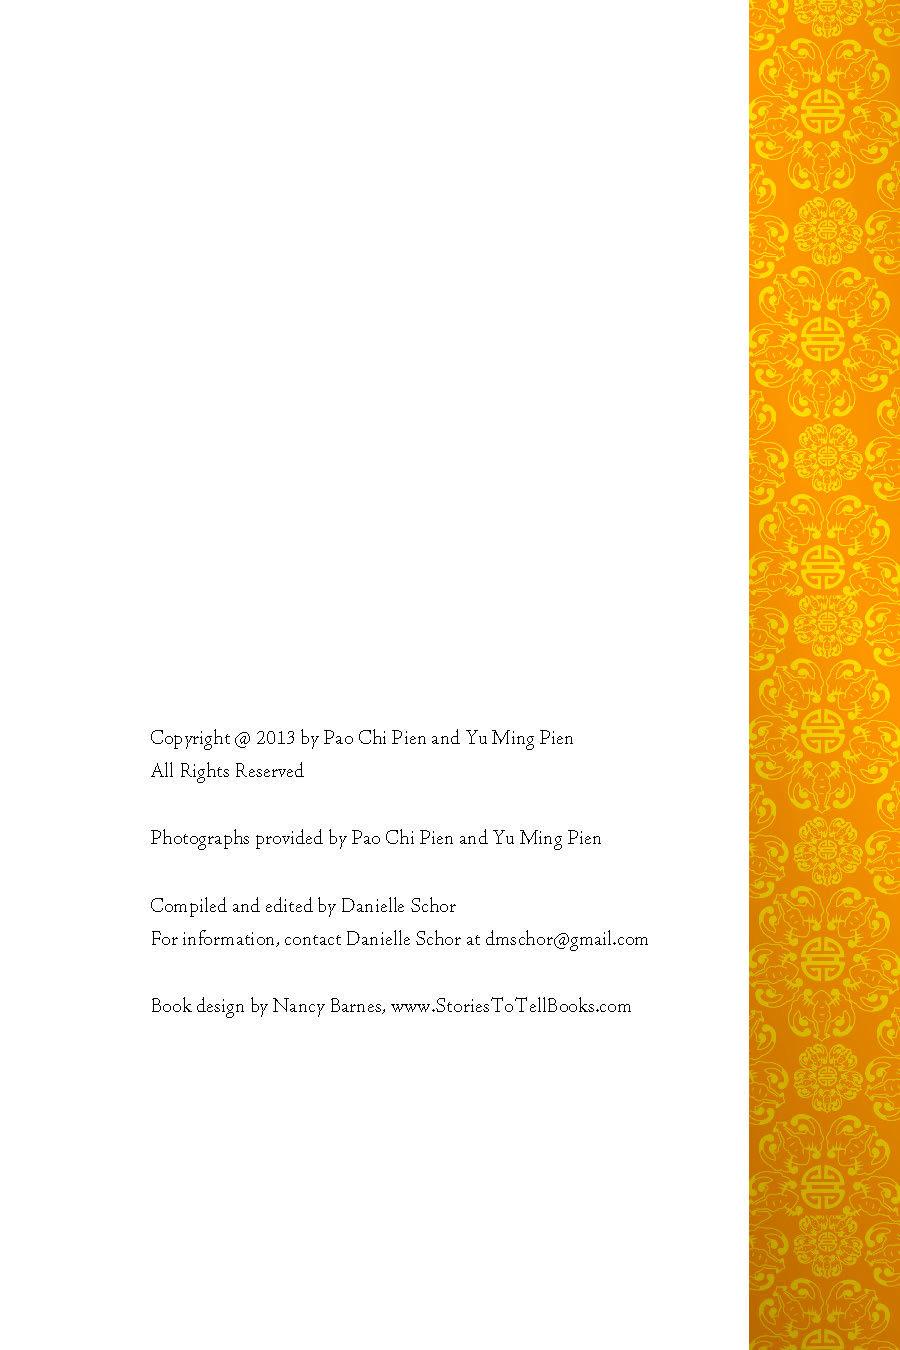 binder4_page_03.jpg